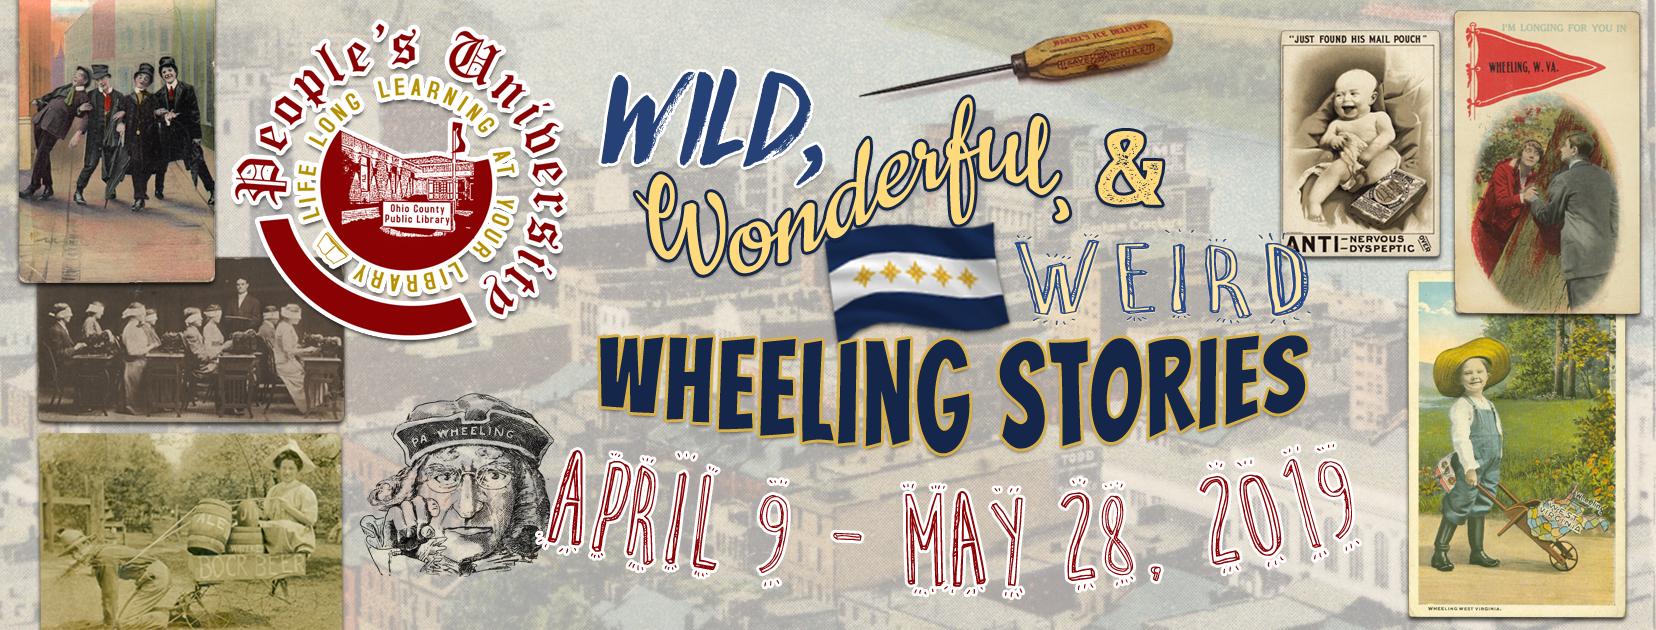 People's University: Wild, Wonderful, and Weird Wheeeling Stories